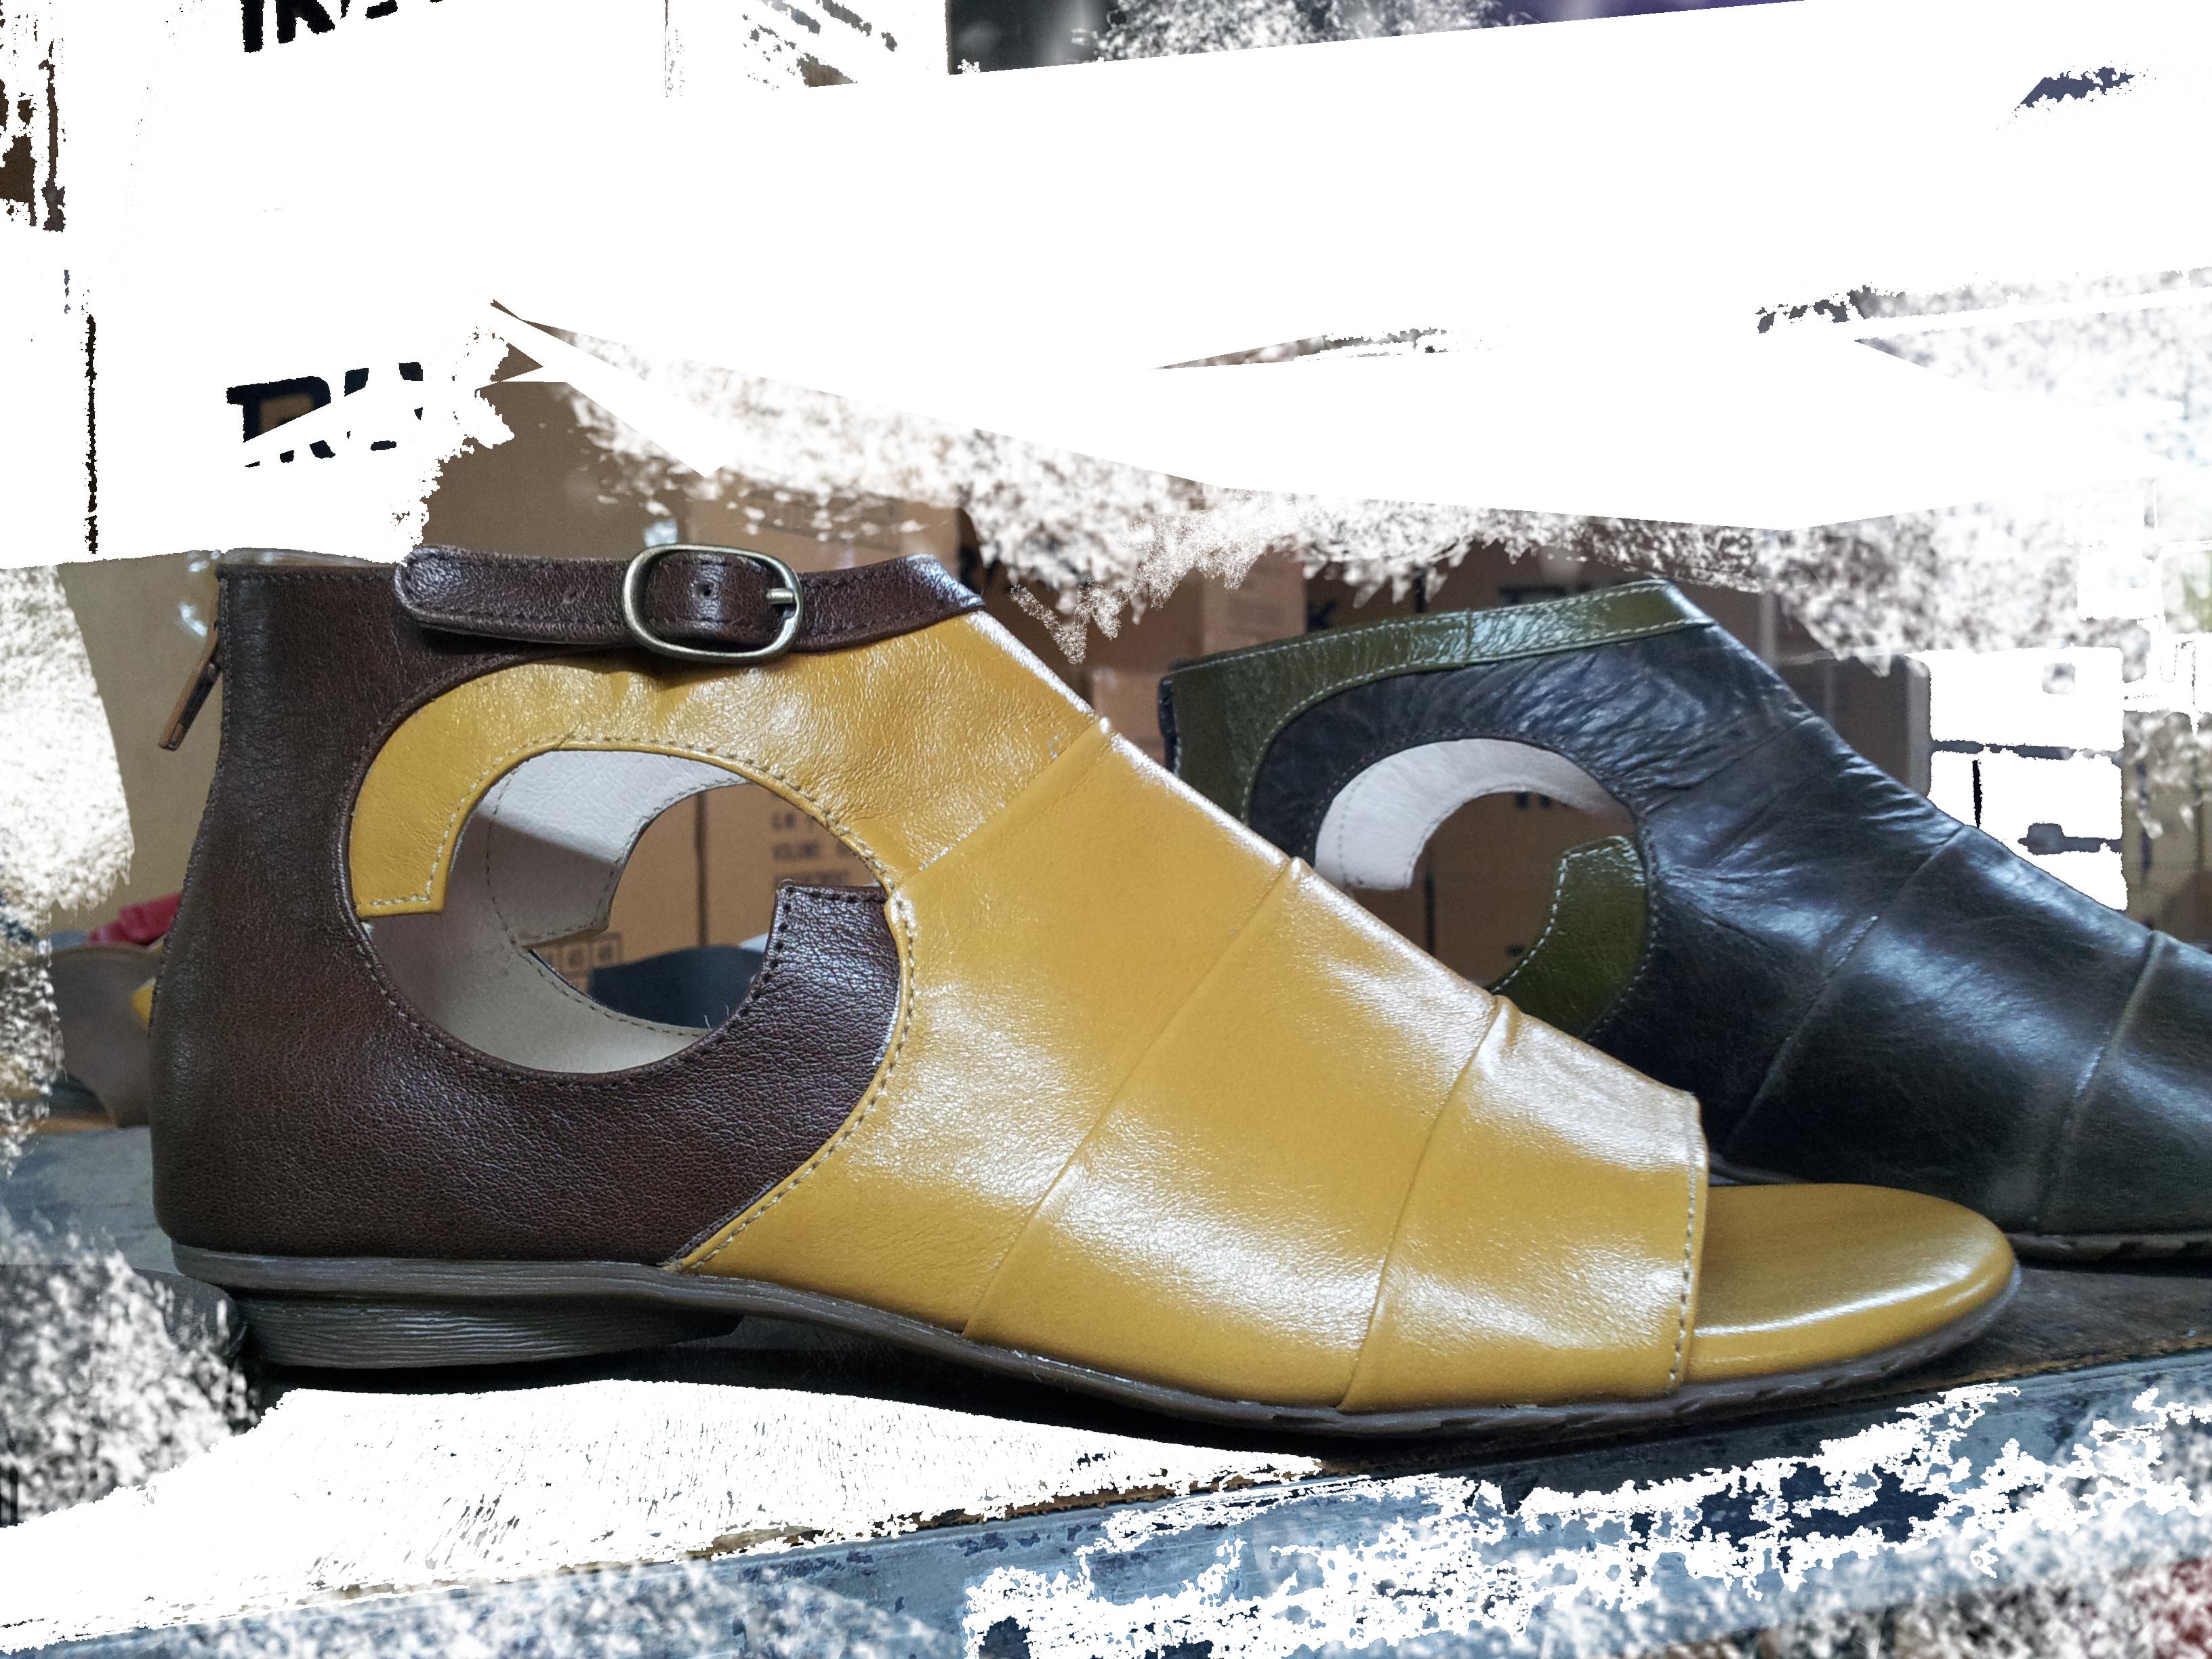 Sandals straps with seam